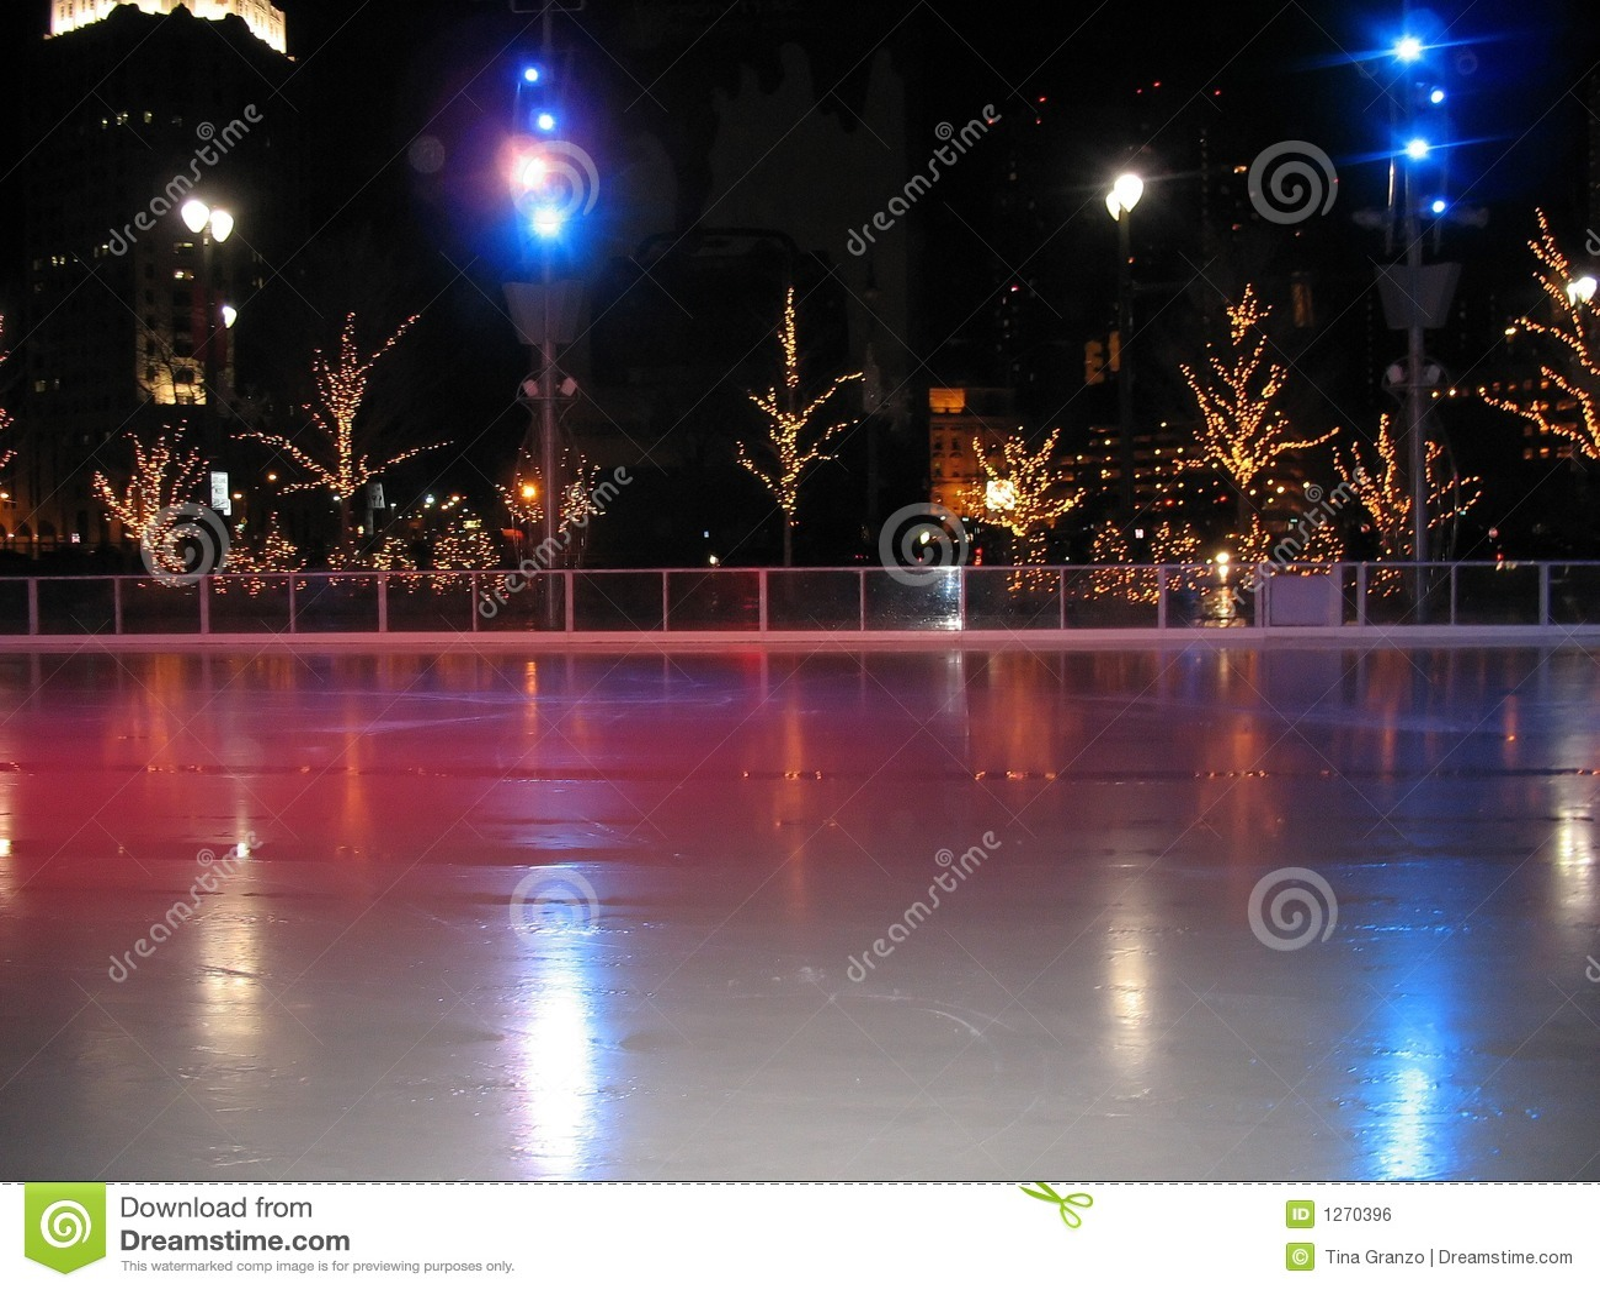 Detroit ice rink